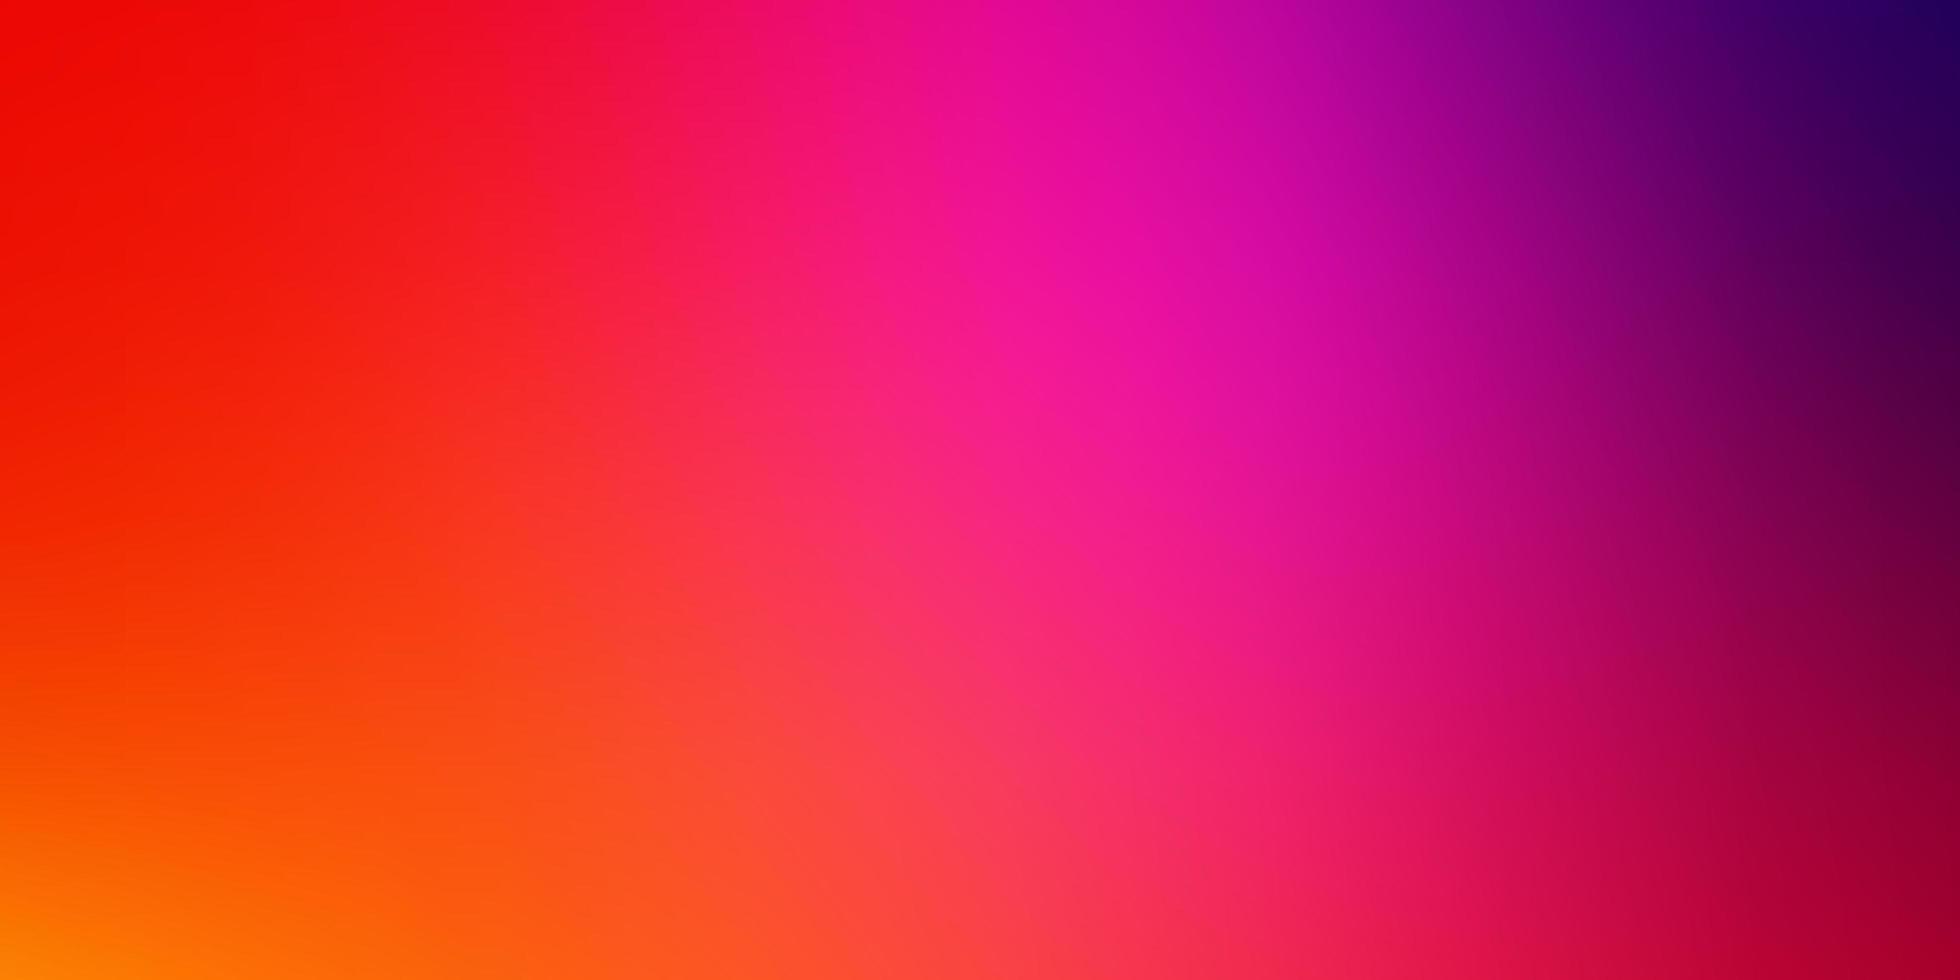 rosa claro, amarillo vector plantilla colorida borrosa.